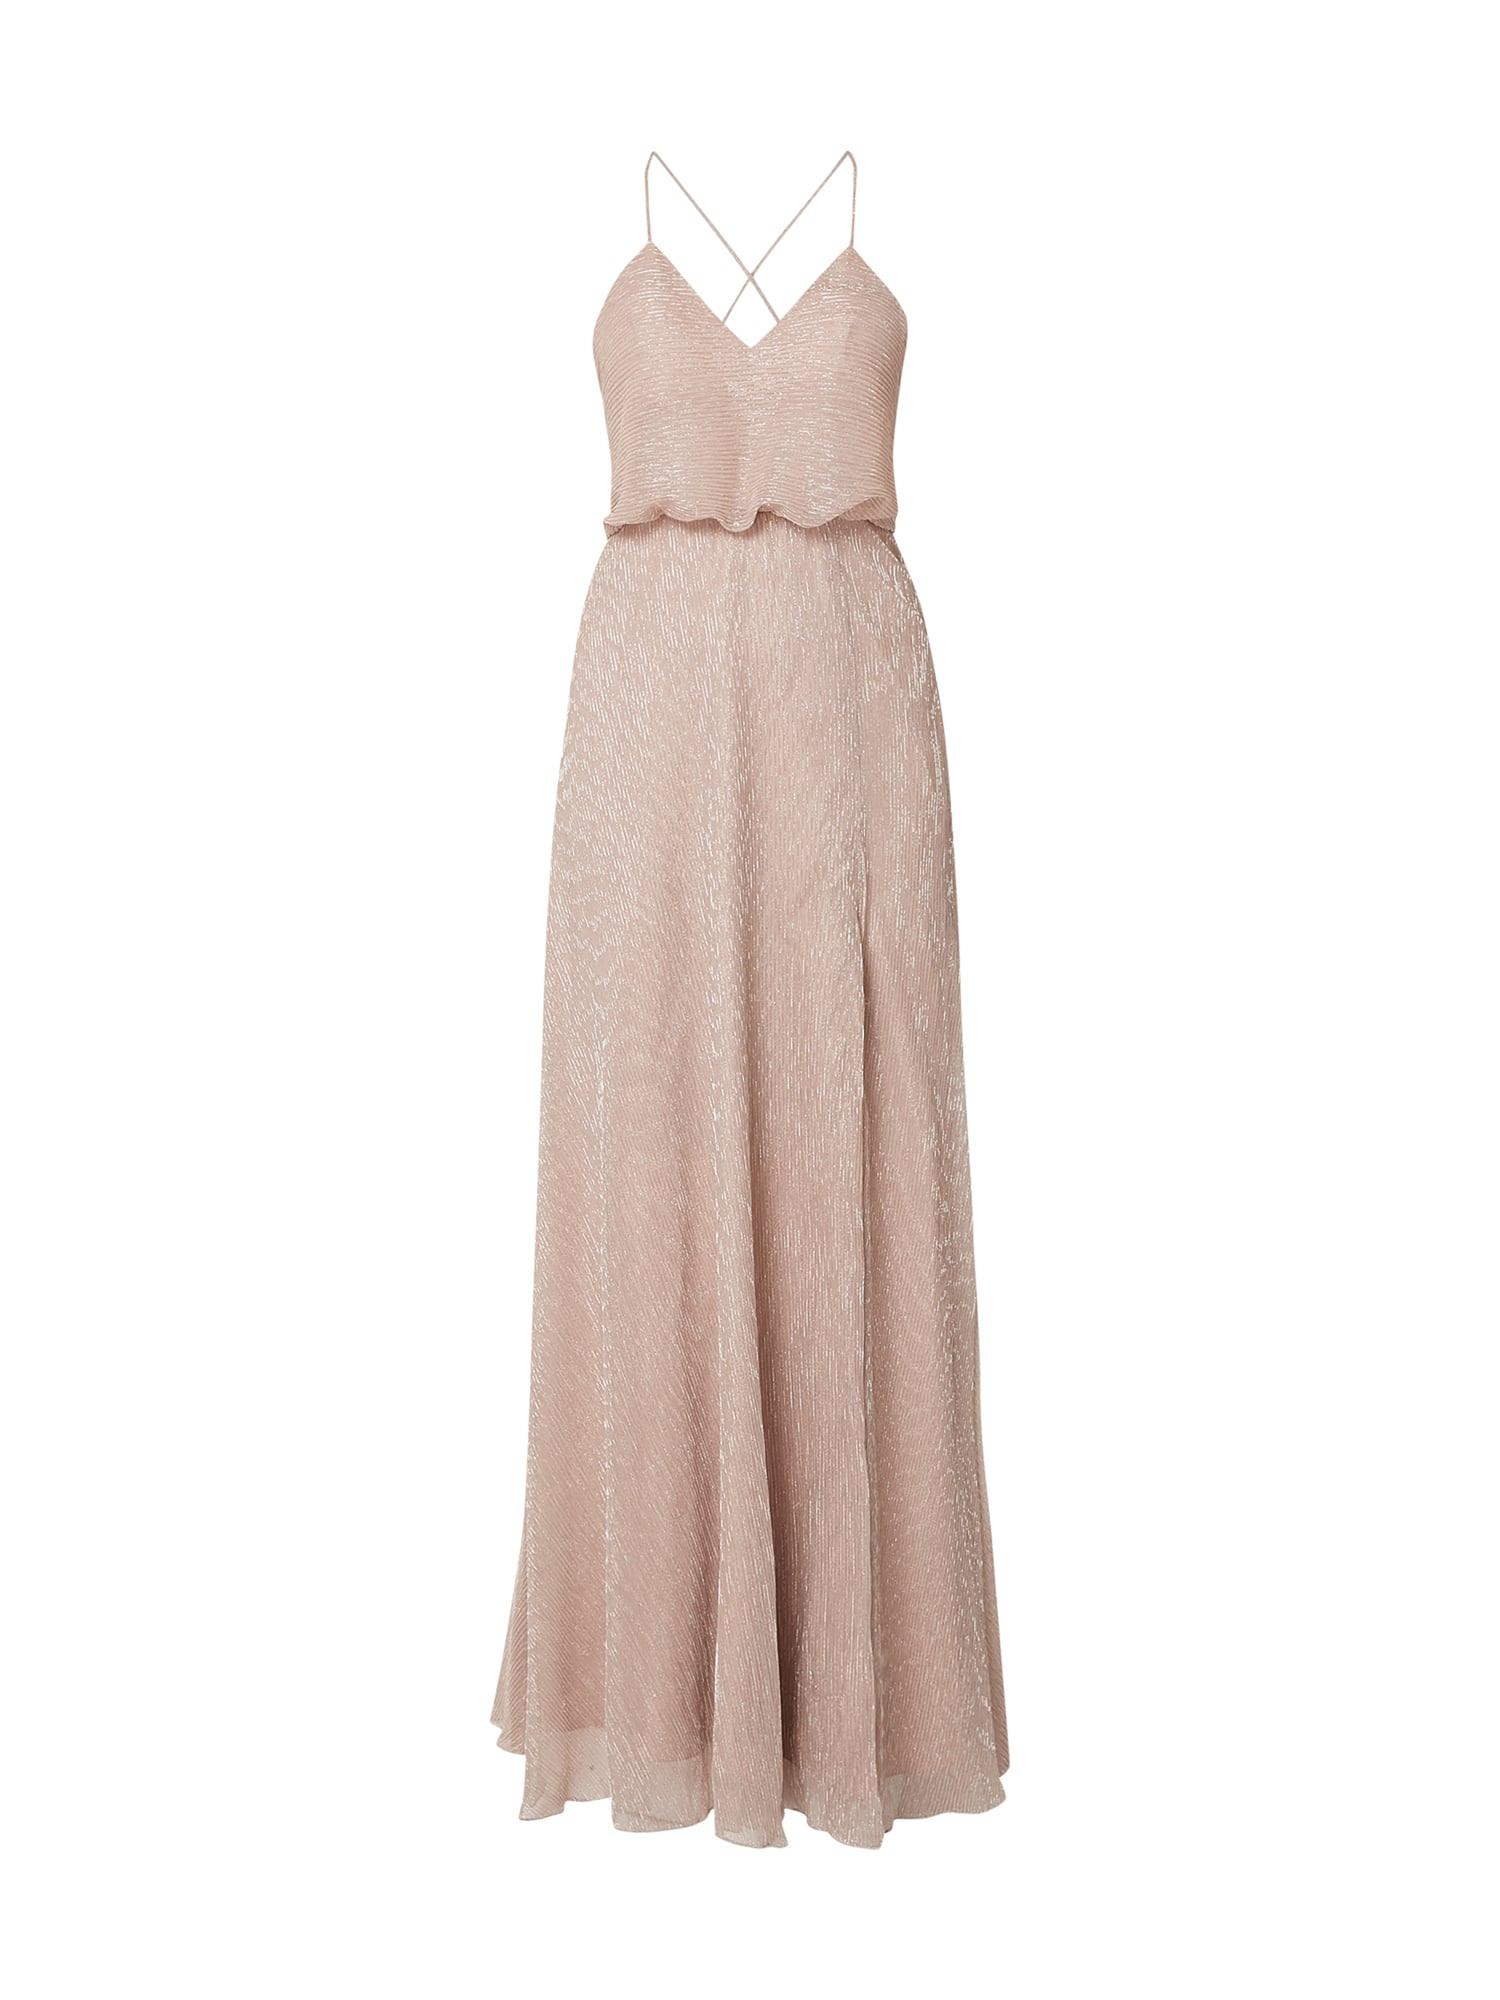 Designer Top Rose Abend Kleid Design10 Schön Rose Abend Kleid Galerie